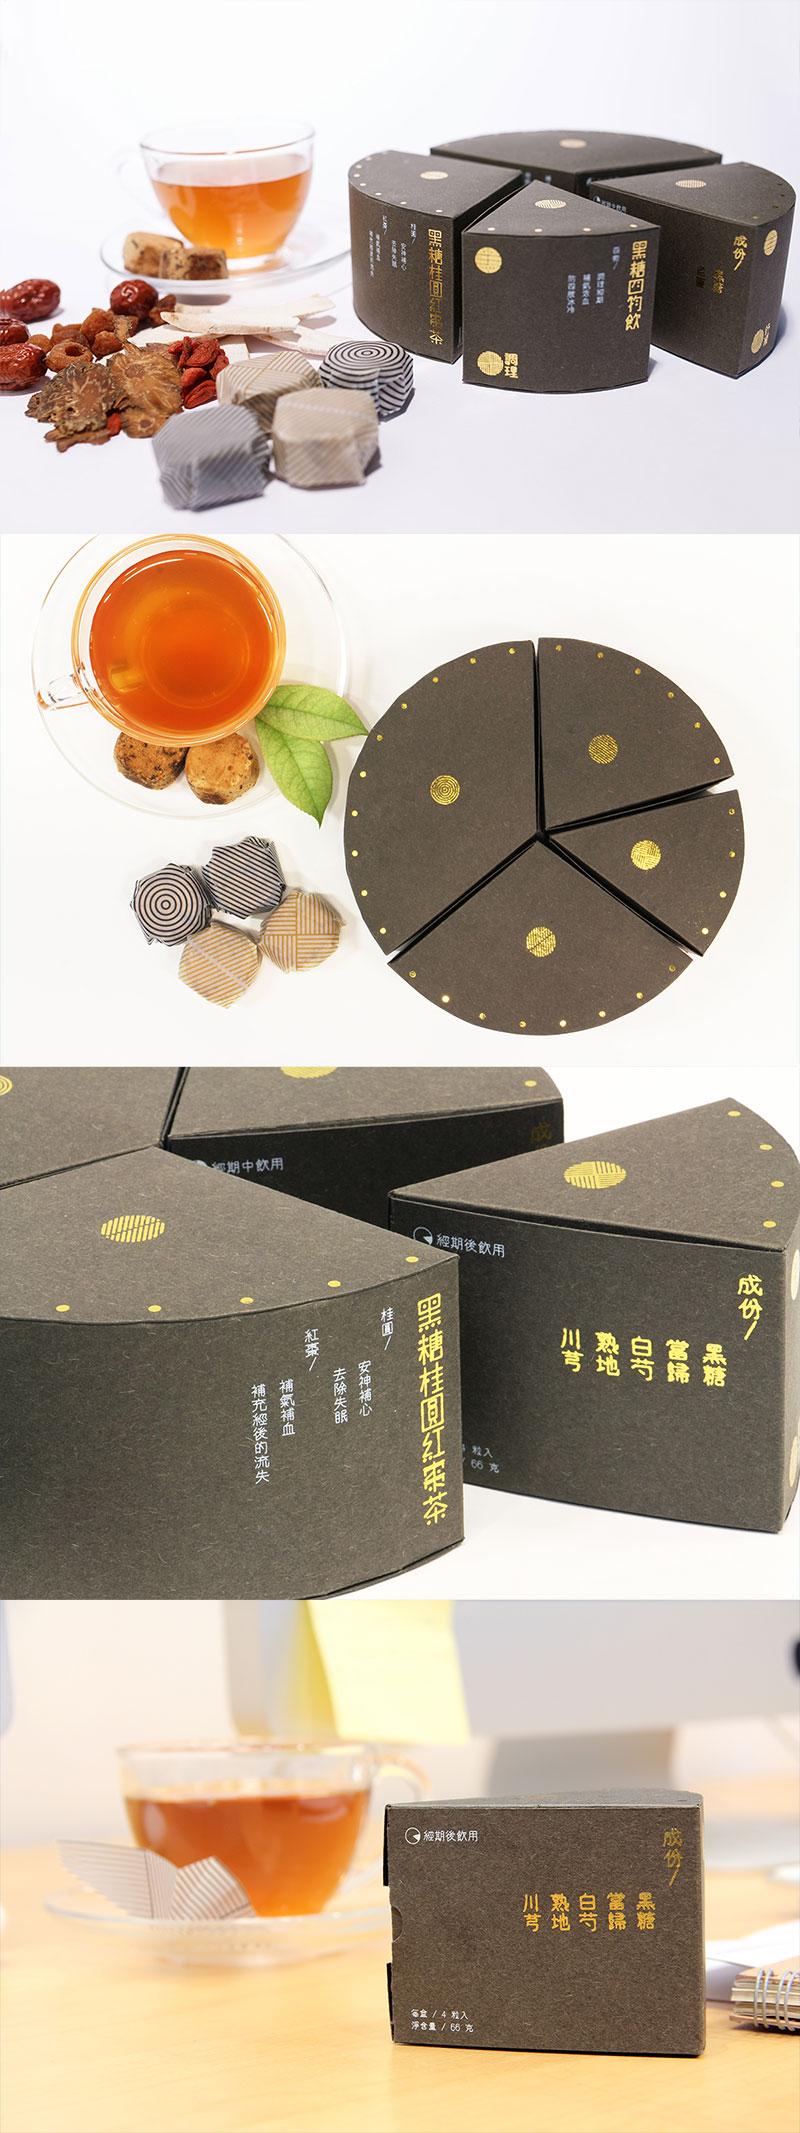 Brown Sugar Tea by Fina Li